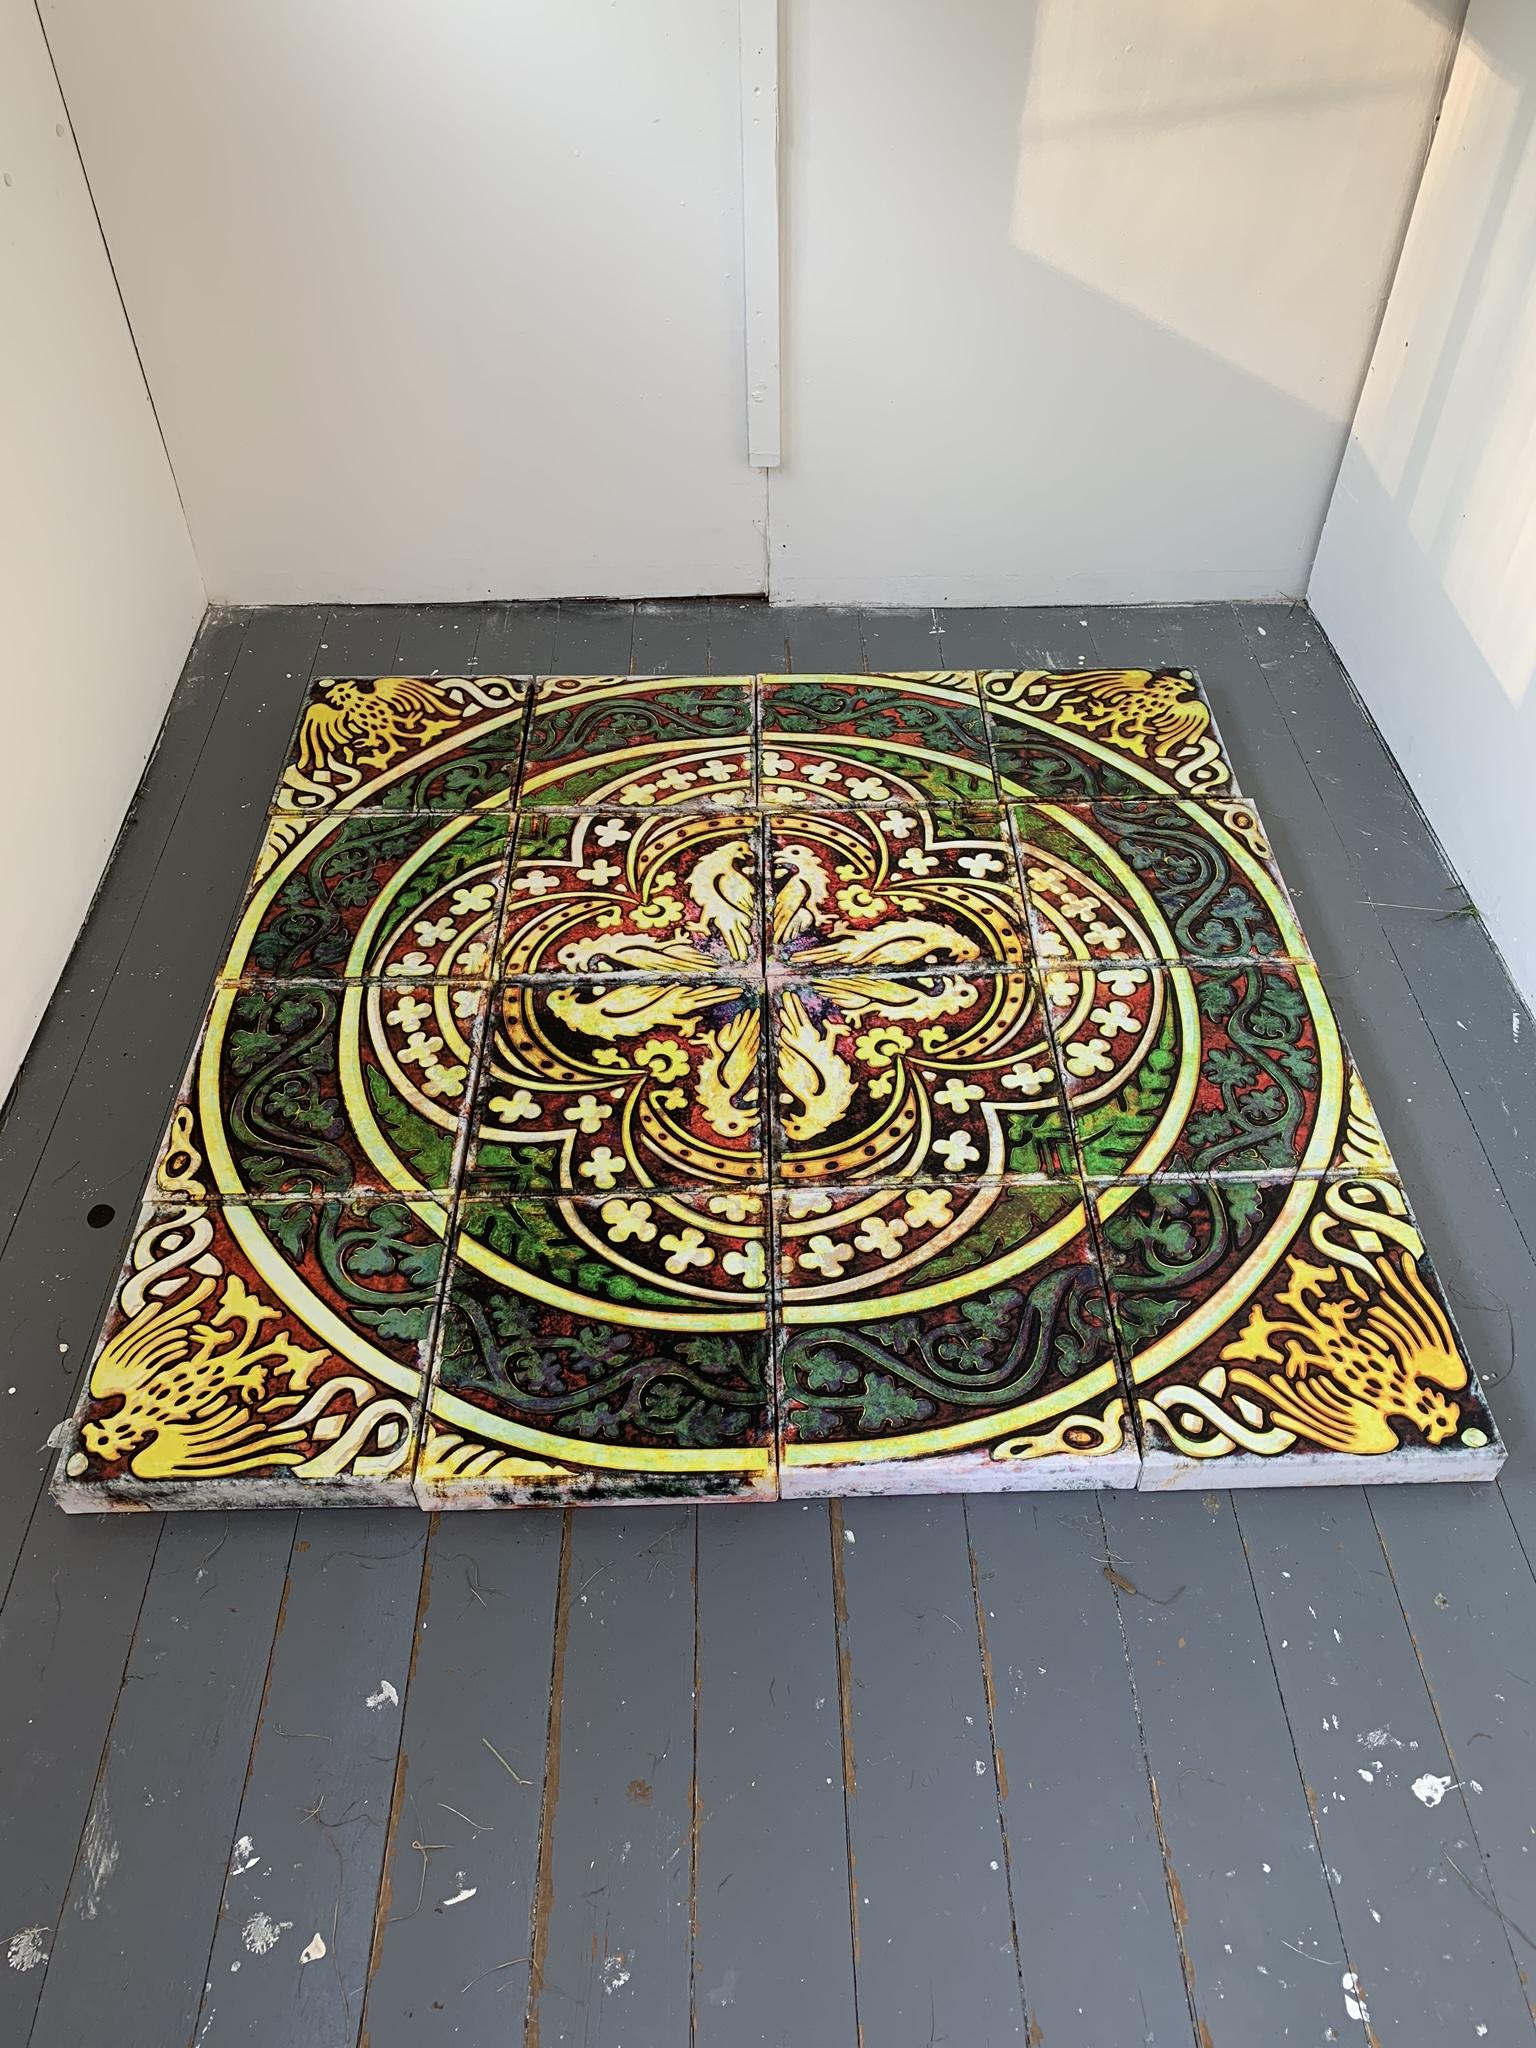 Ceramic tiles Greenbelt 2019